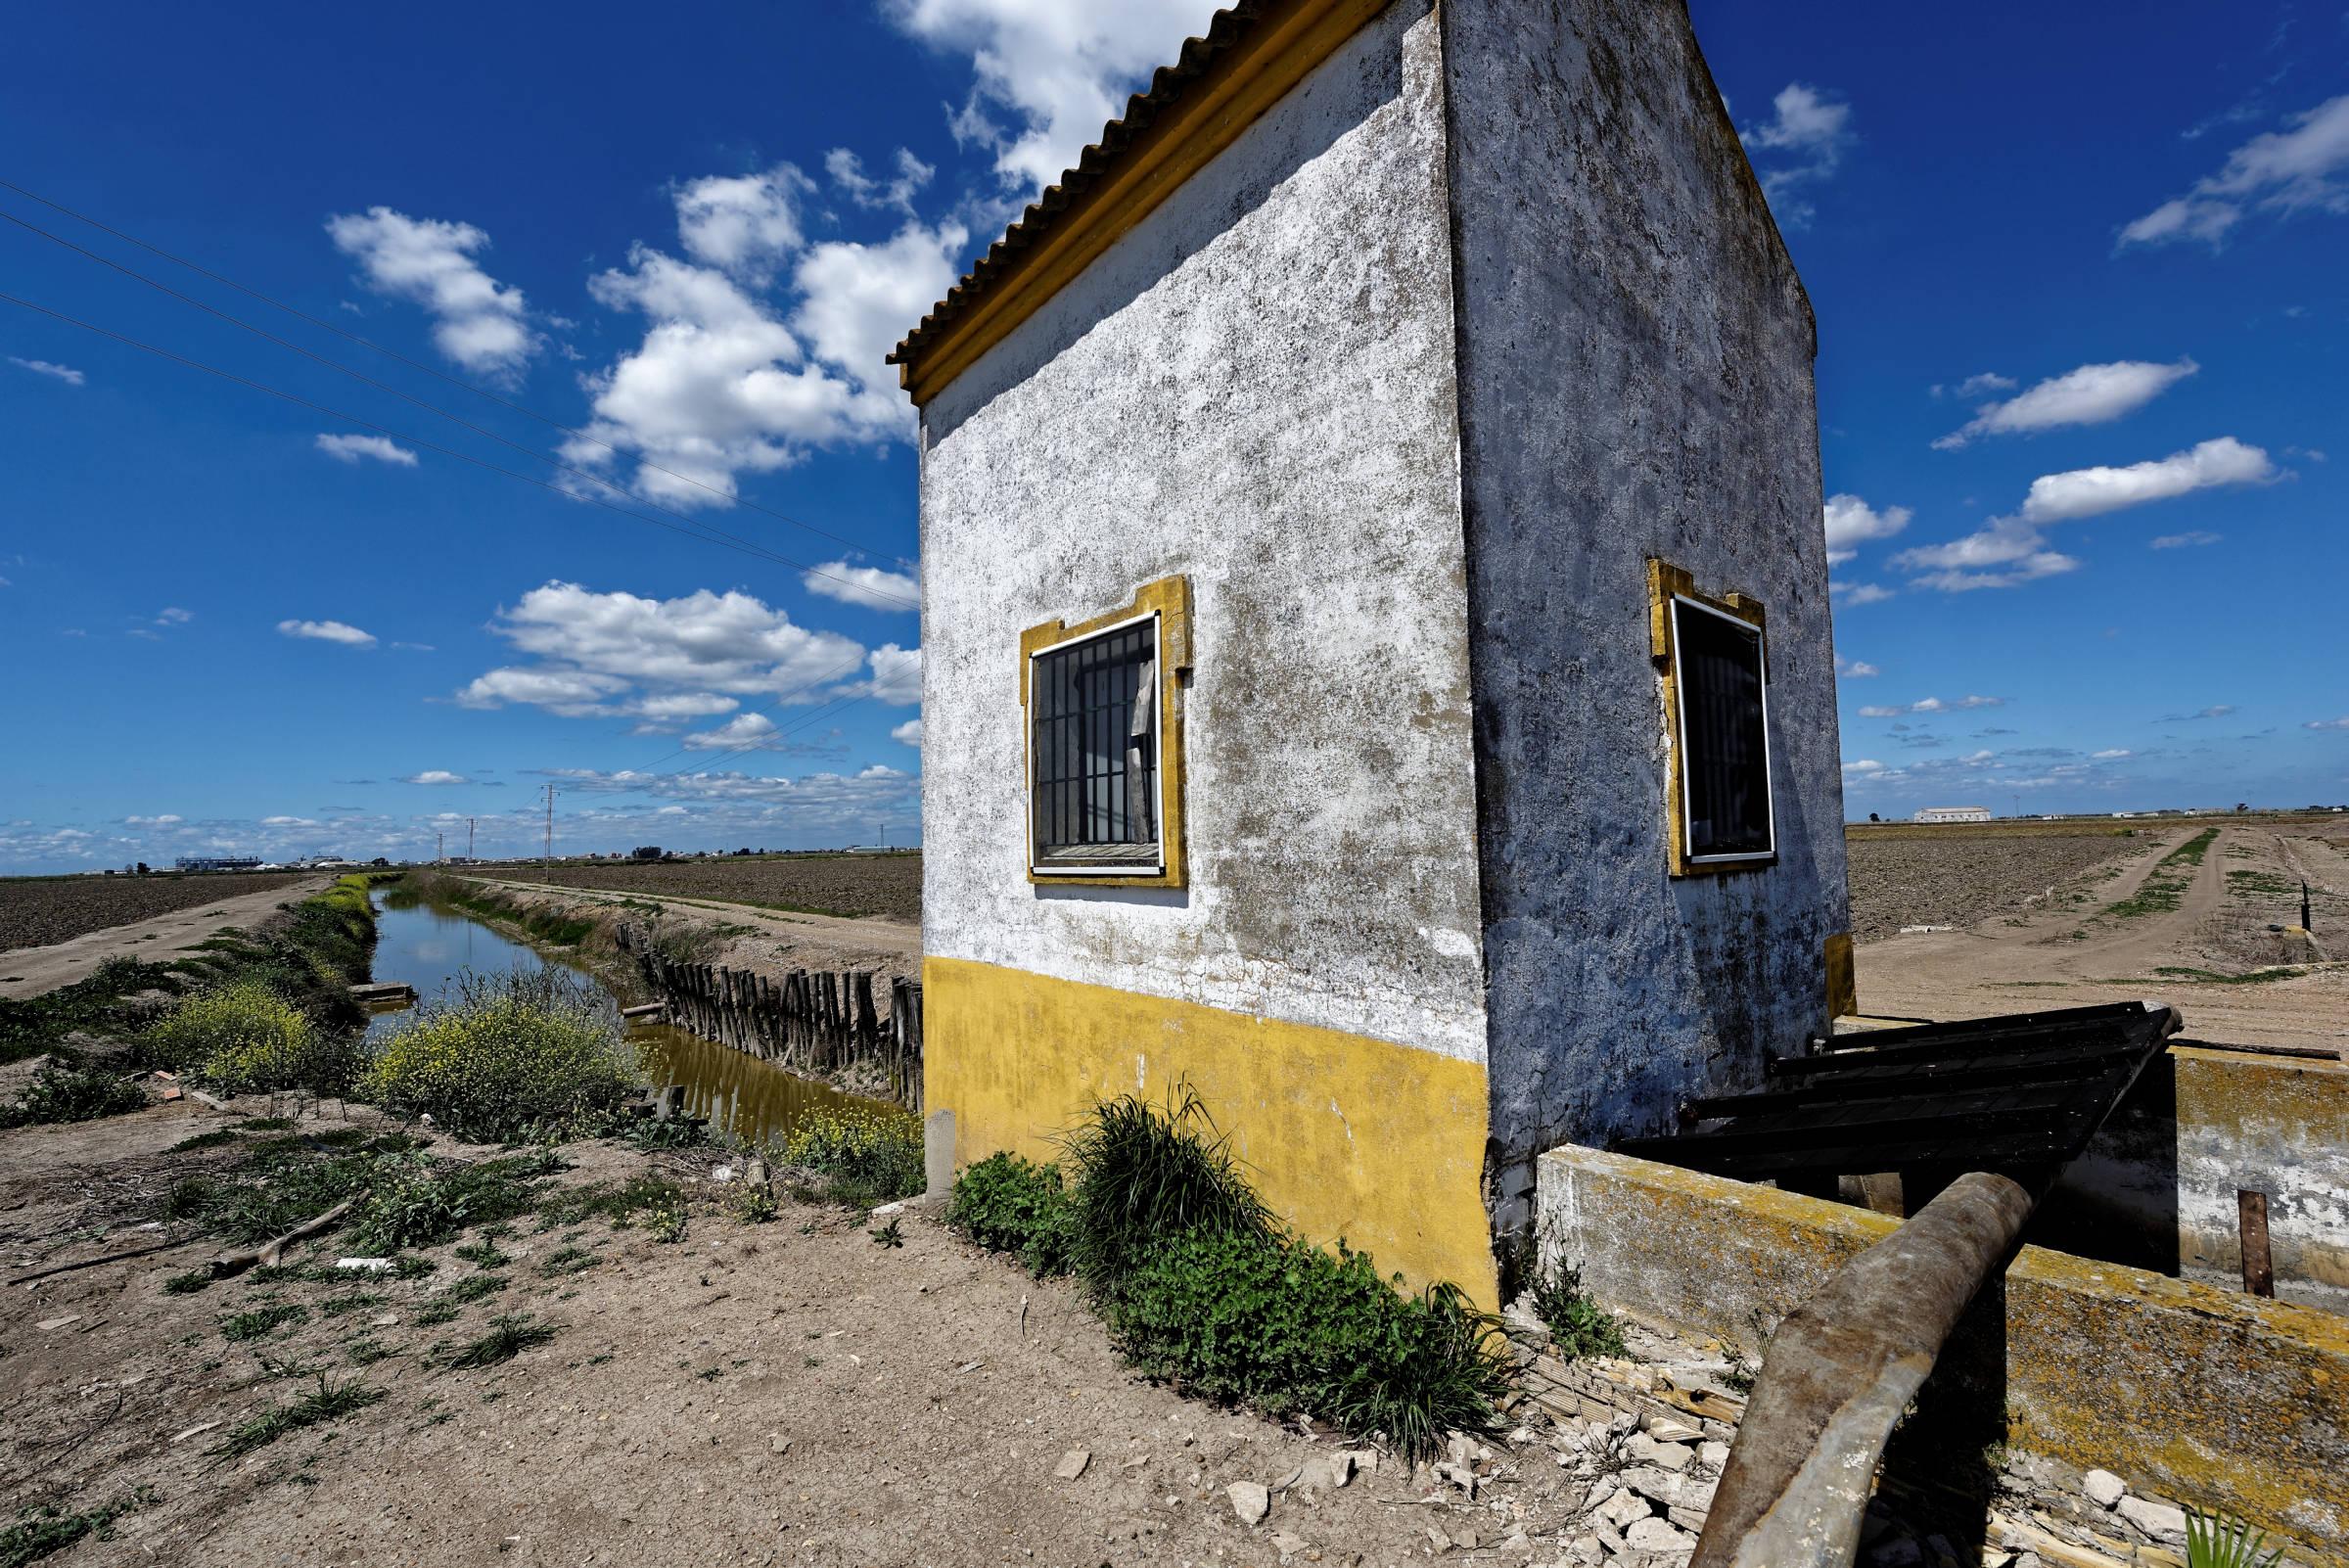 160414-Isla minima - Escobar (Andalousie) (56)